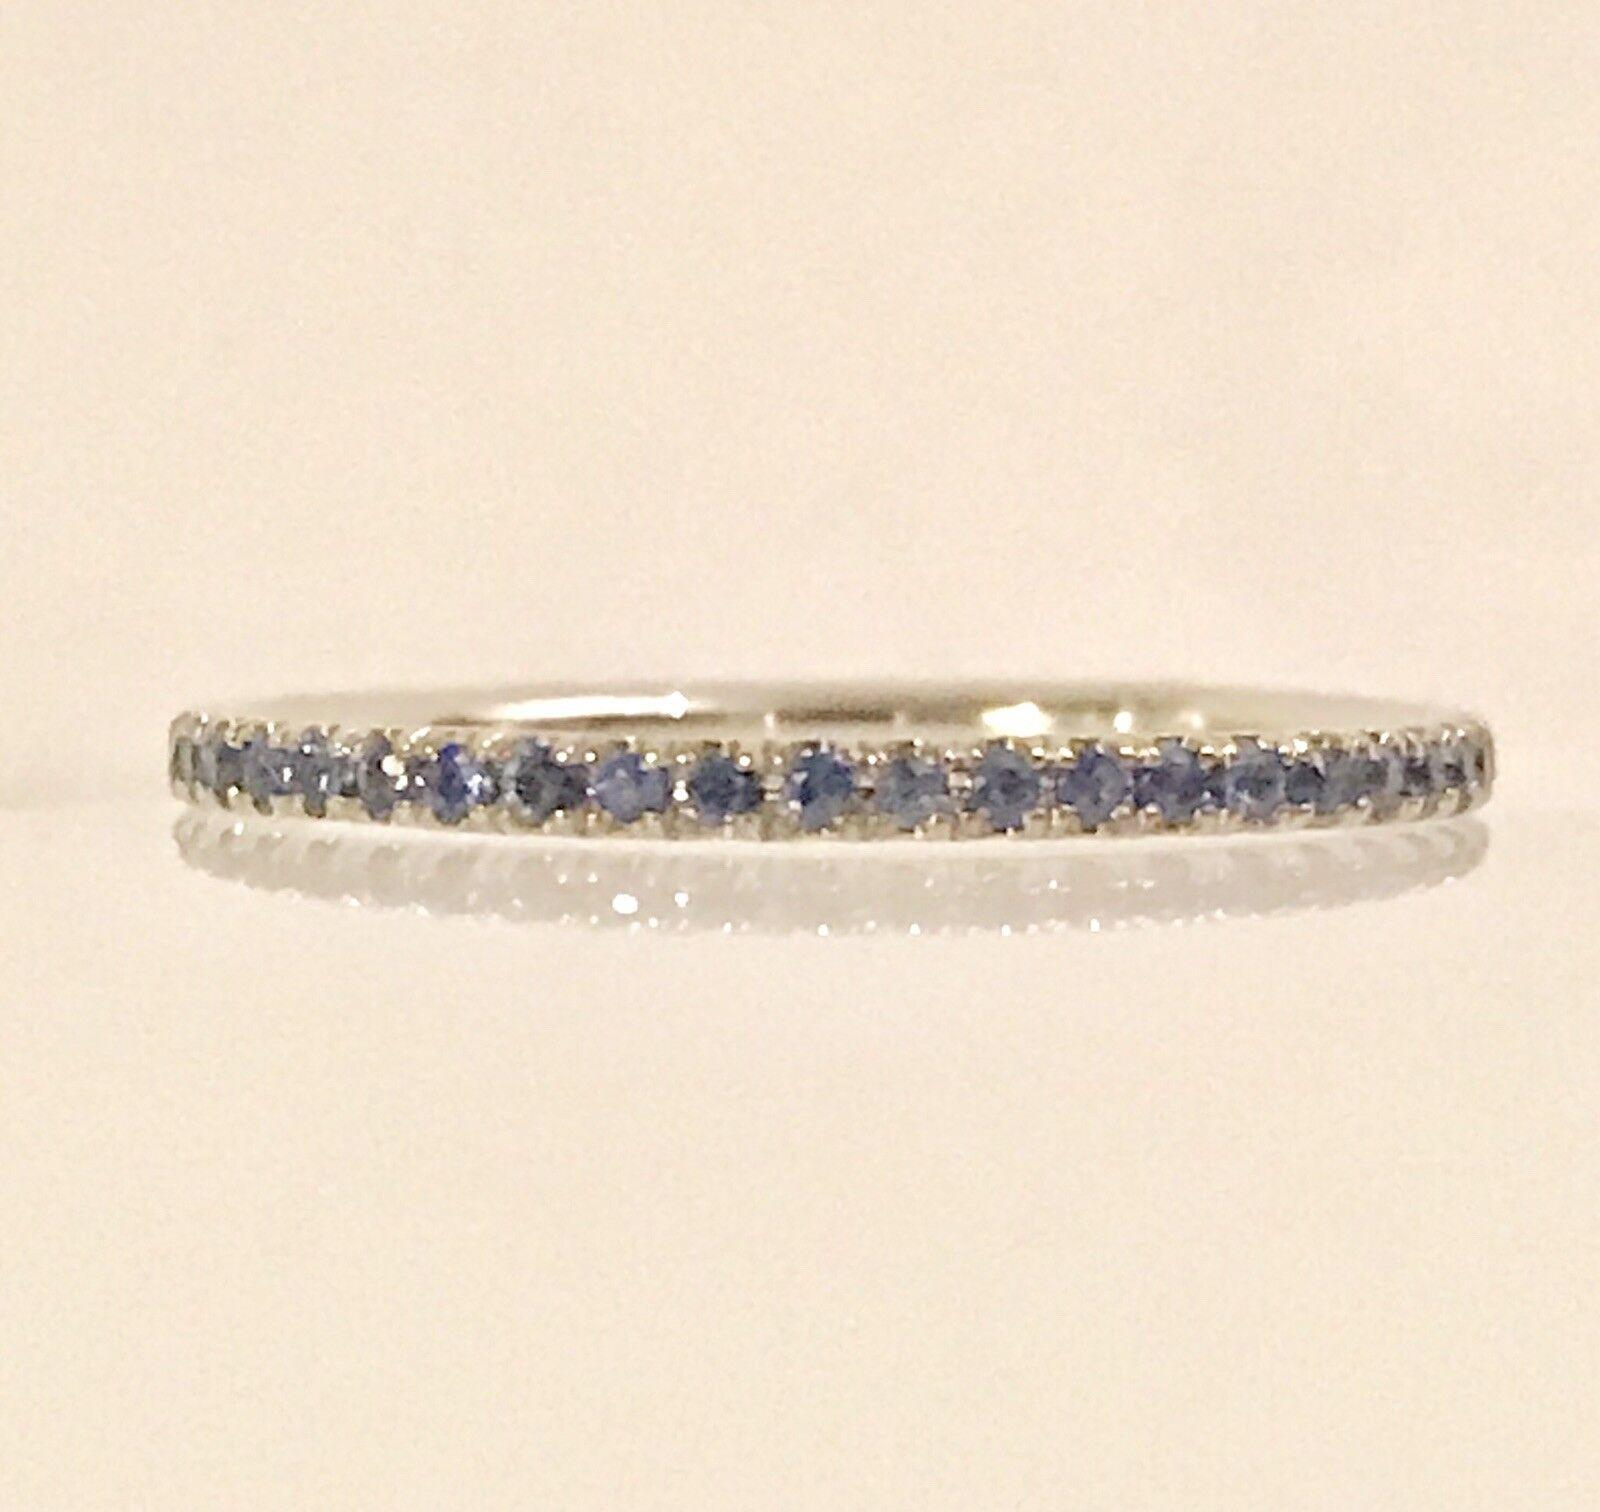 bluee Sapphire Round Eternity Gemstone 14k White Real gold Birthstone Ring Size 7